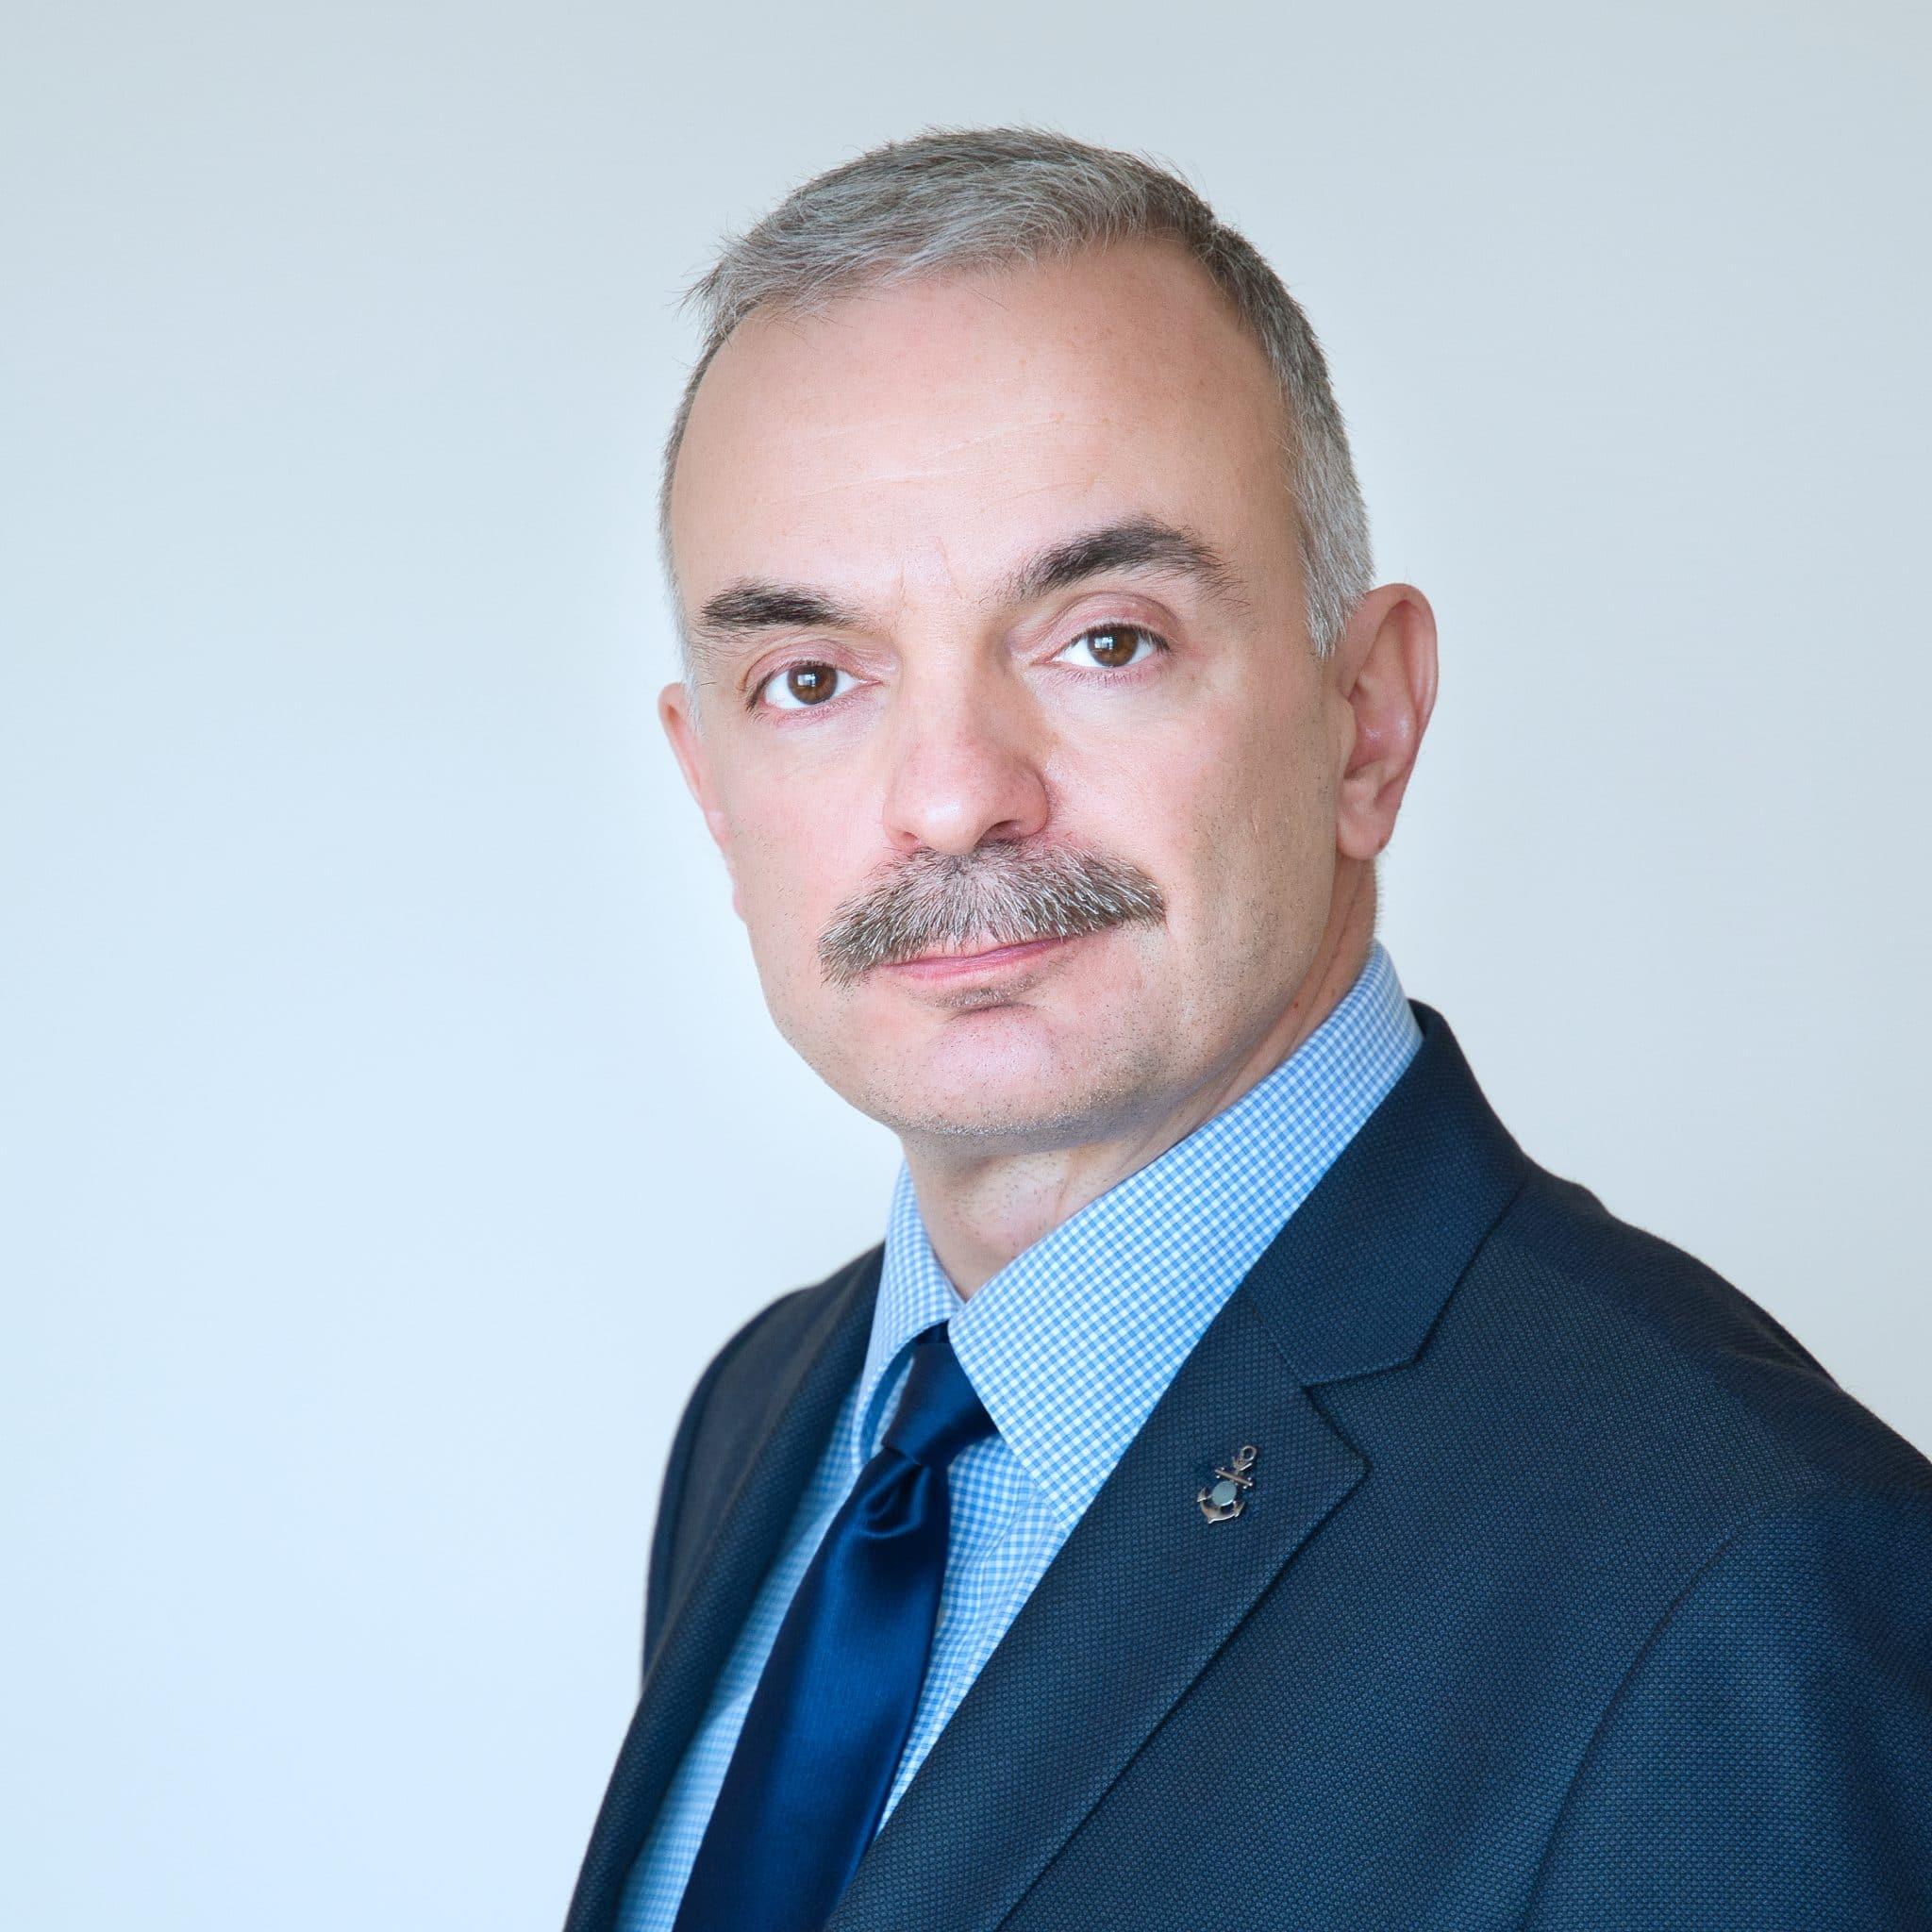 Stefan Chekanov Brosix